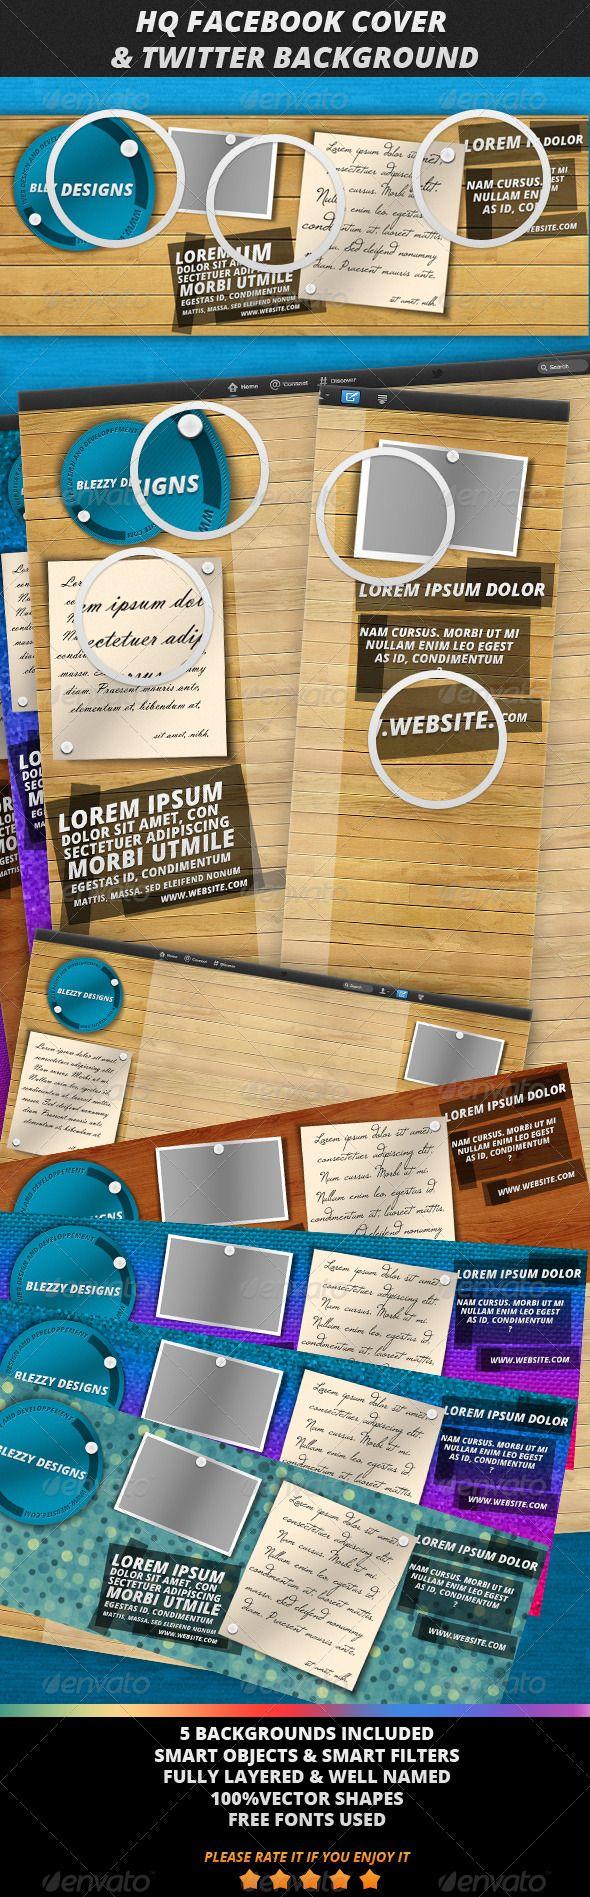 Facebook Timeline Cover & Twitter Background #PSD #Design #Premium